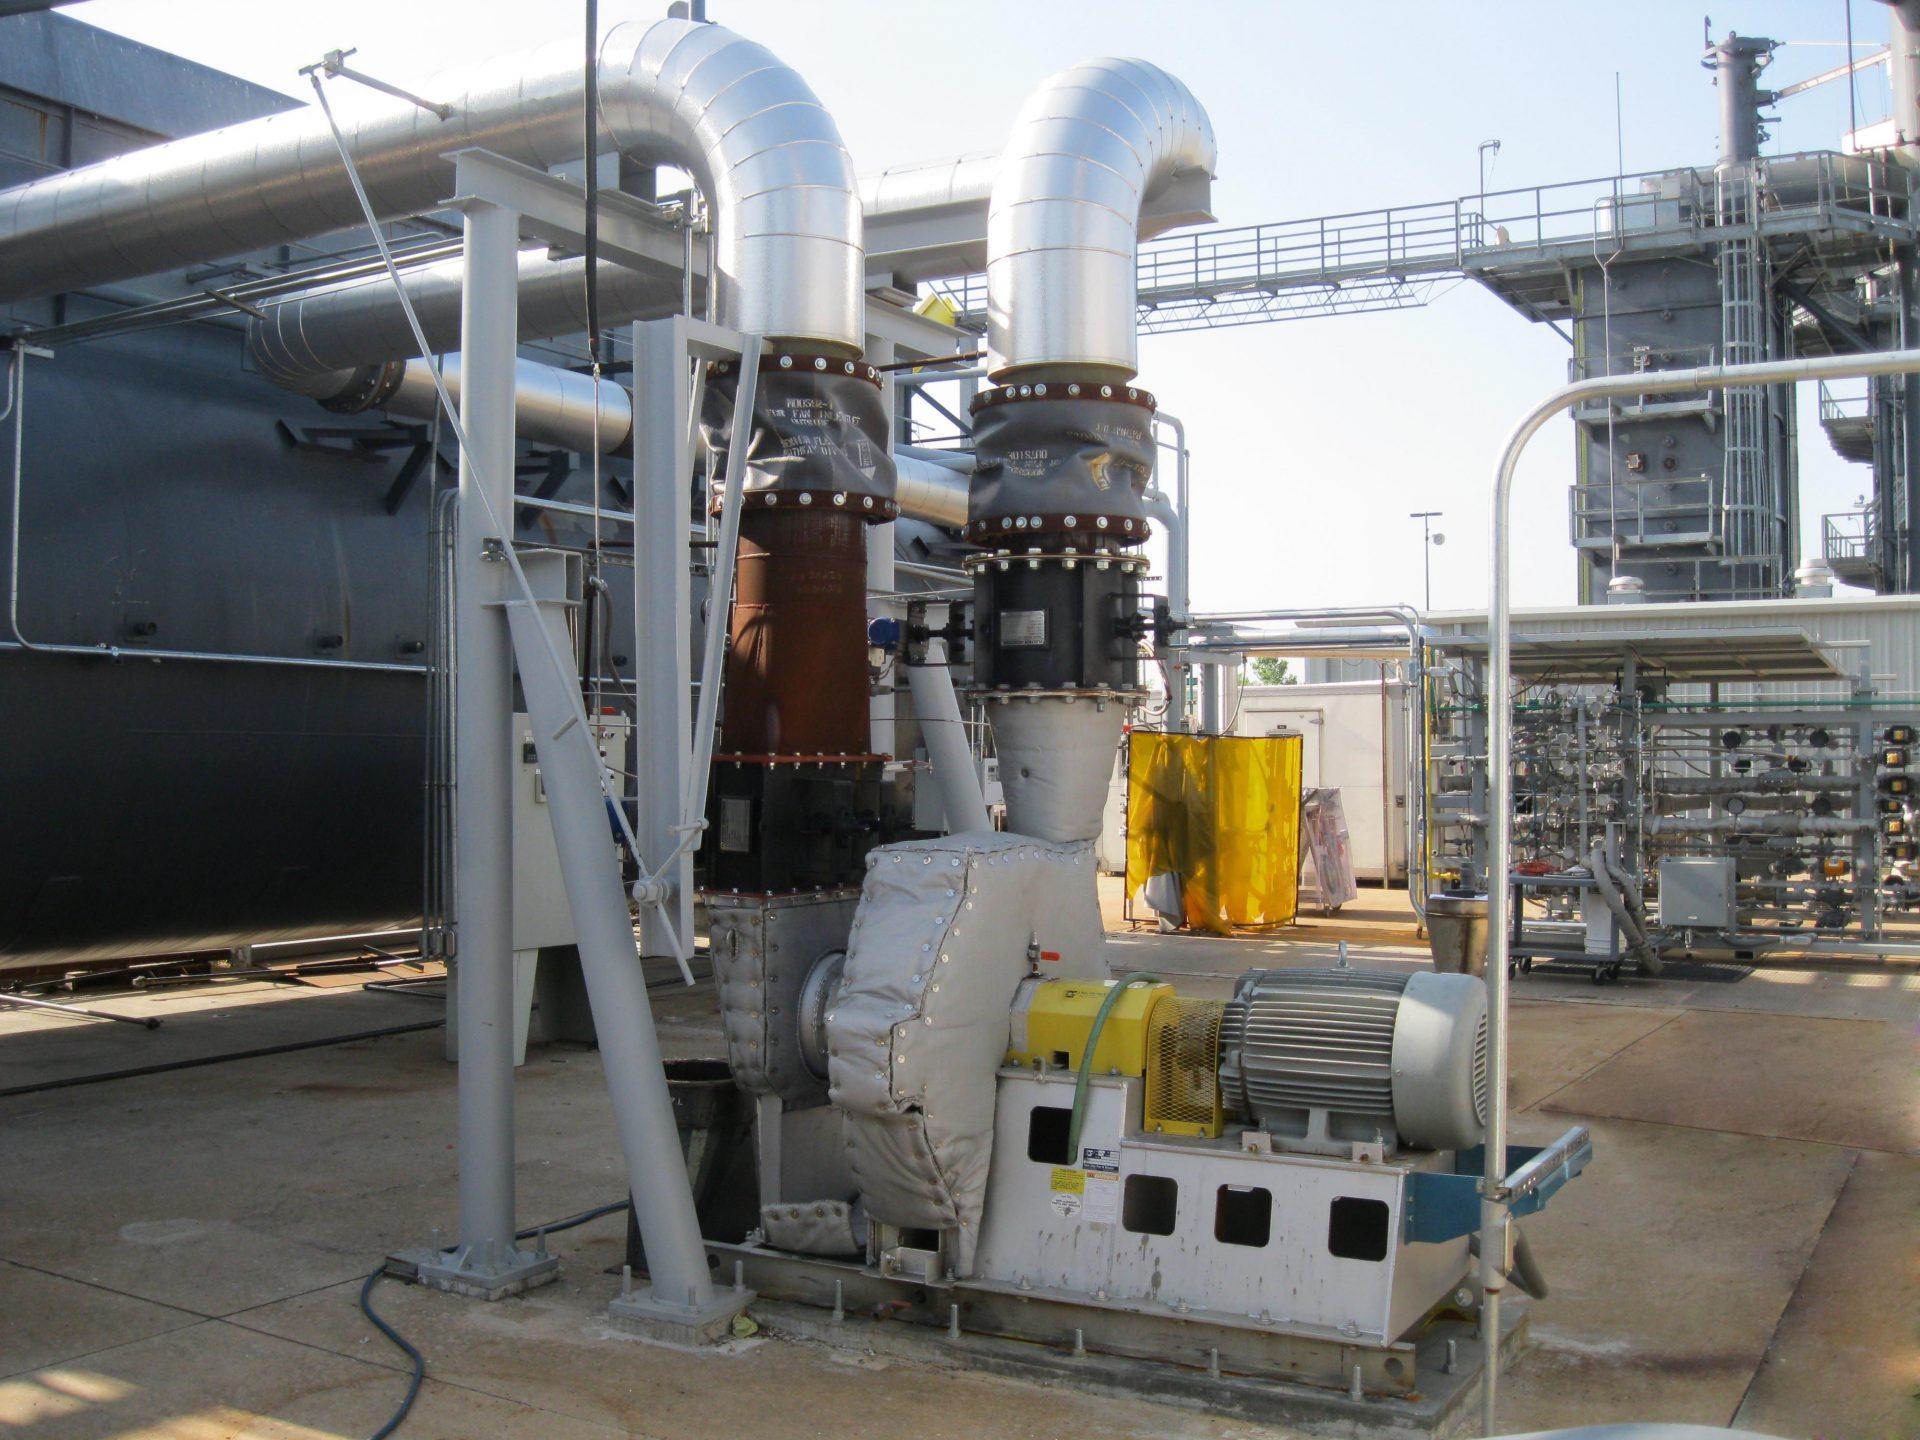 MBO - Flue Gas Recirculation